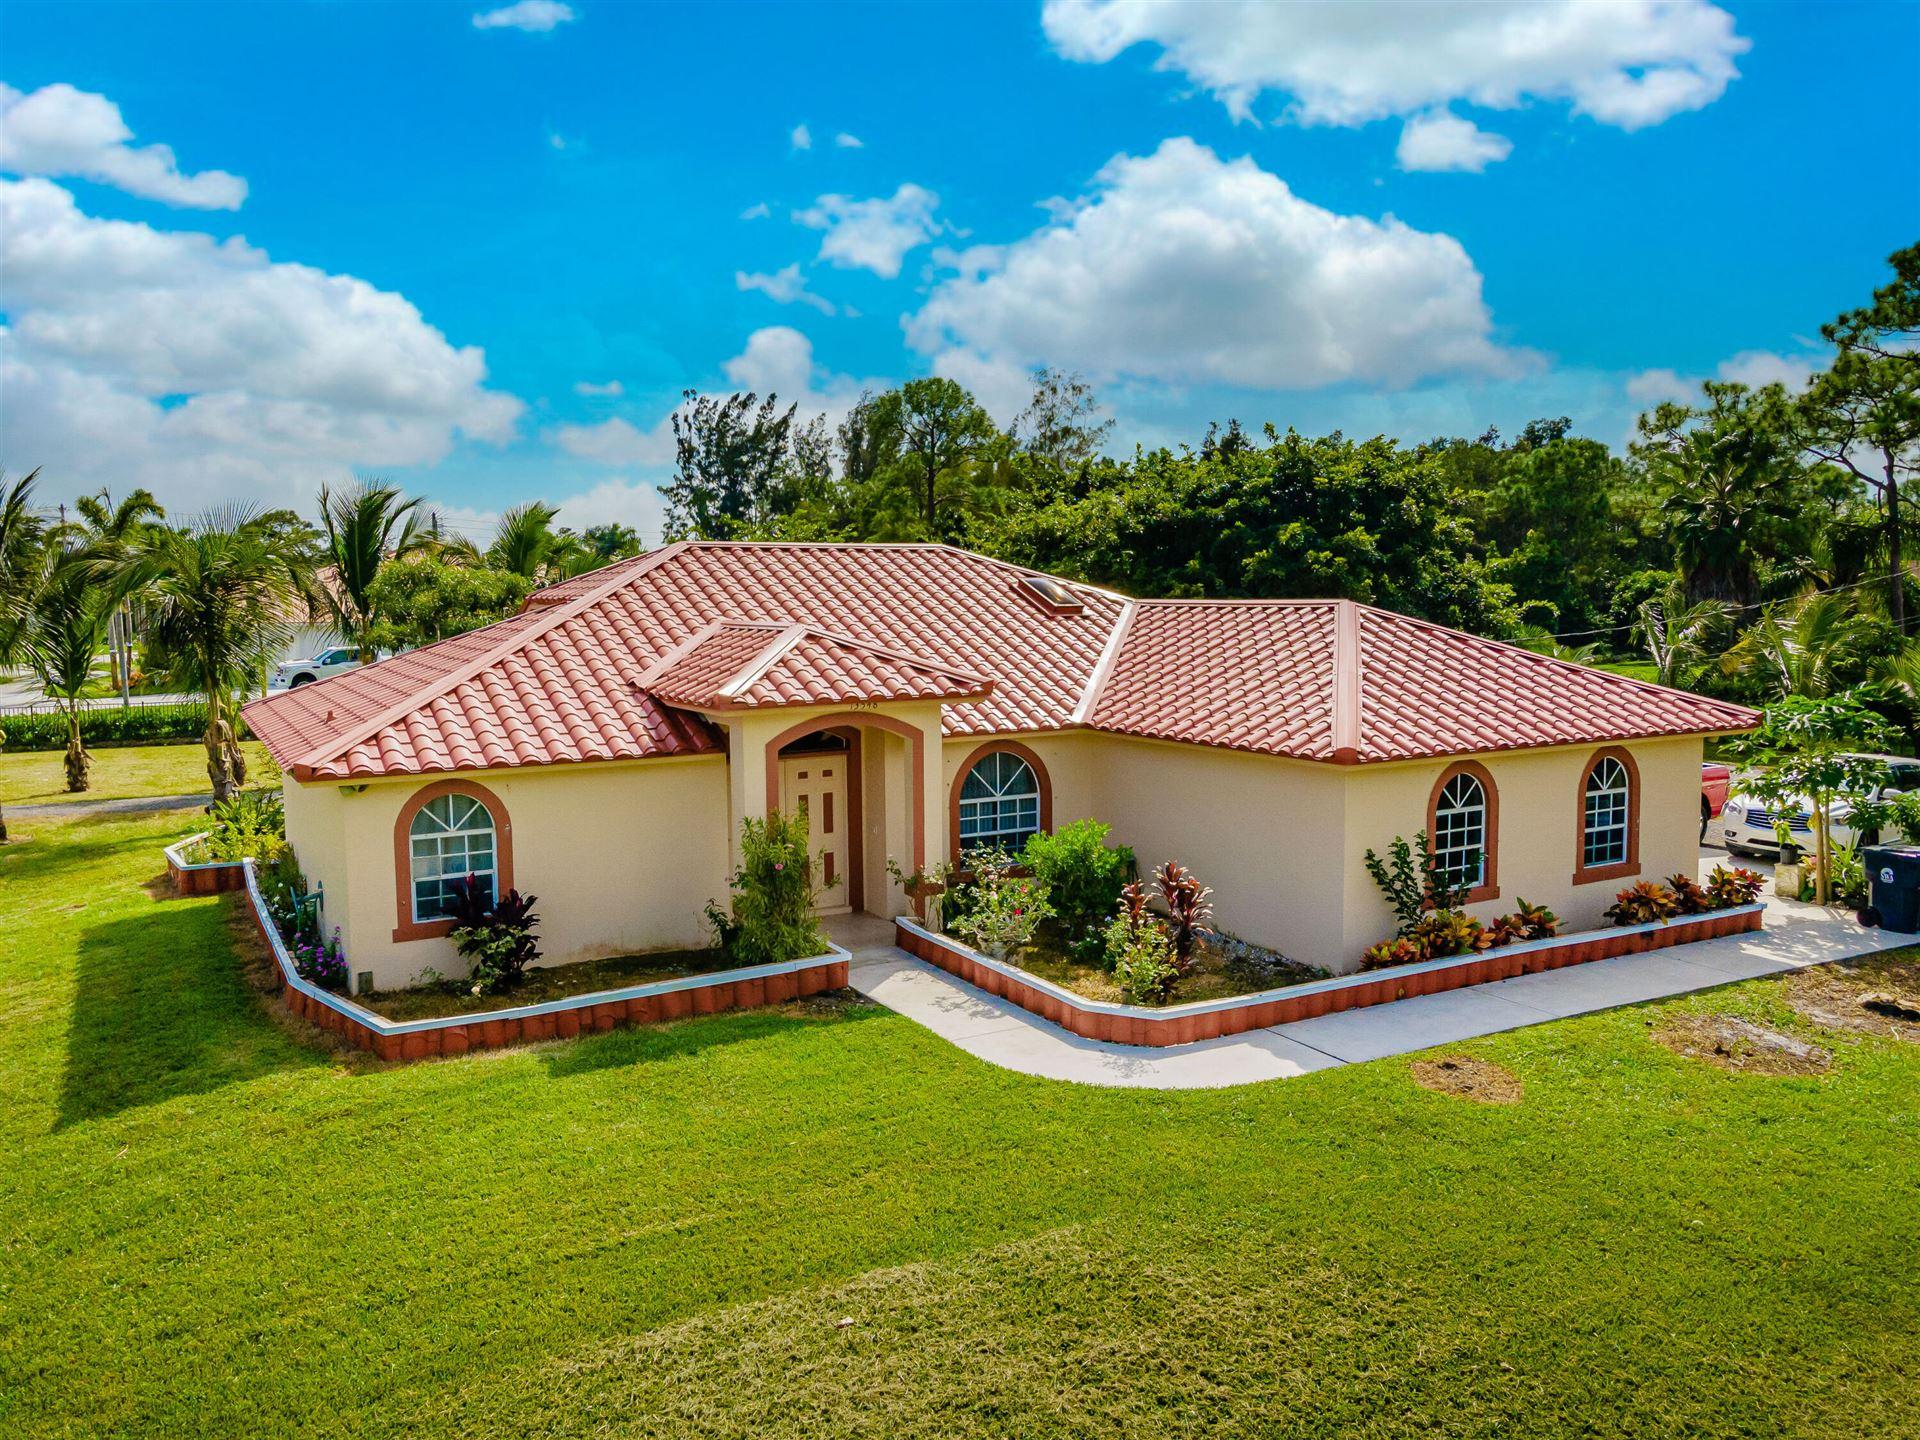 13548 71st Place N, West Palm Beach, FL 33412 - #: RX-10751931